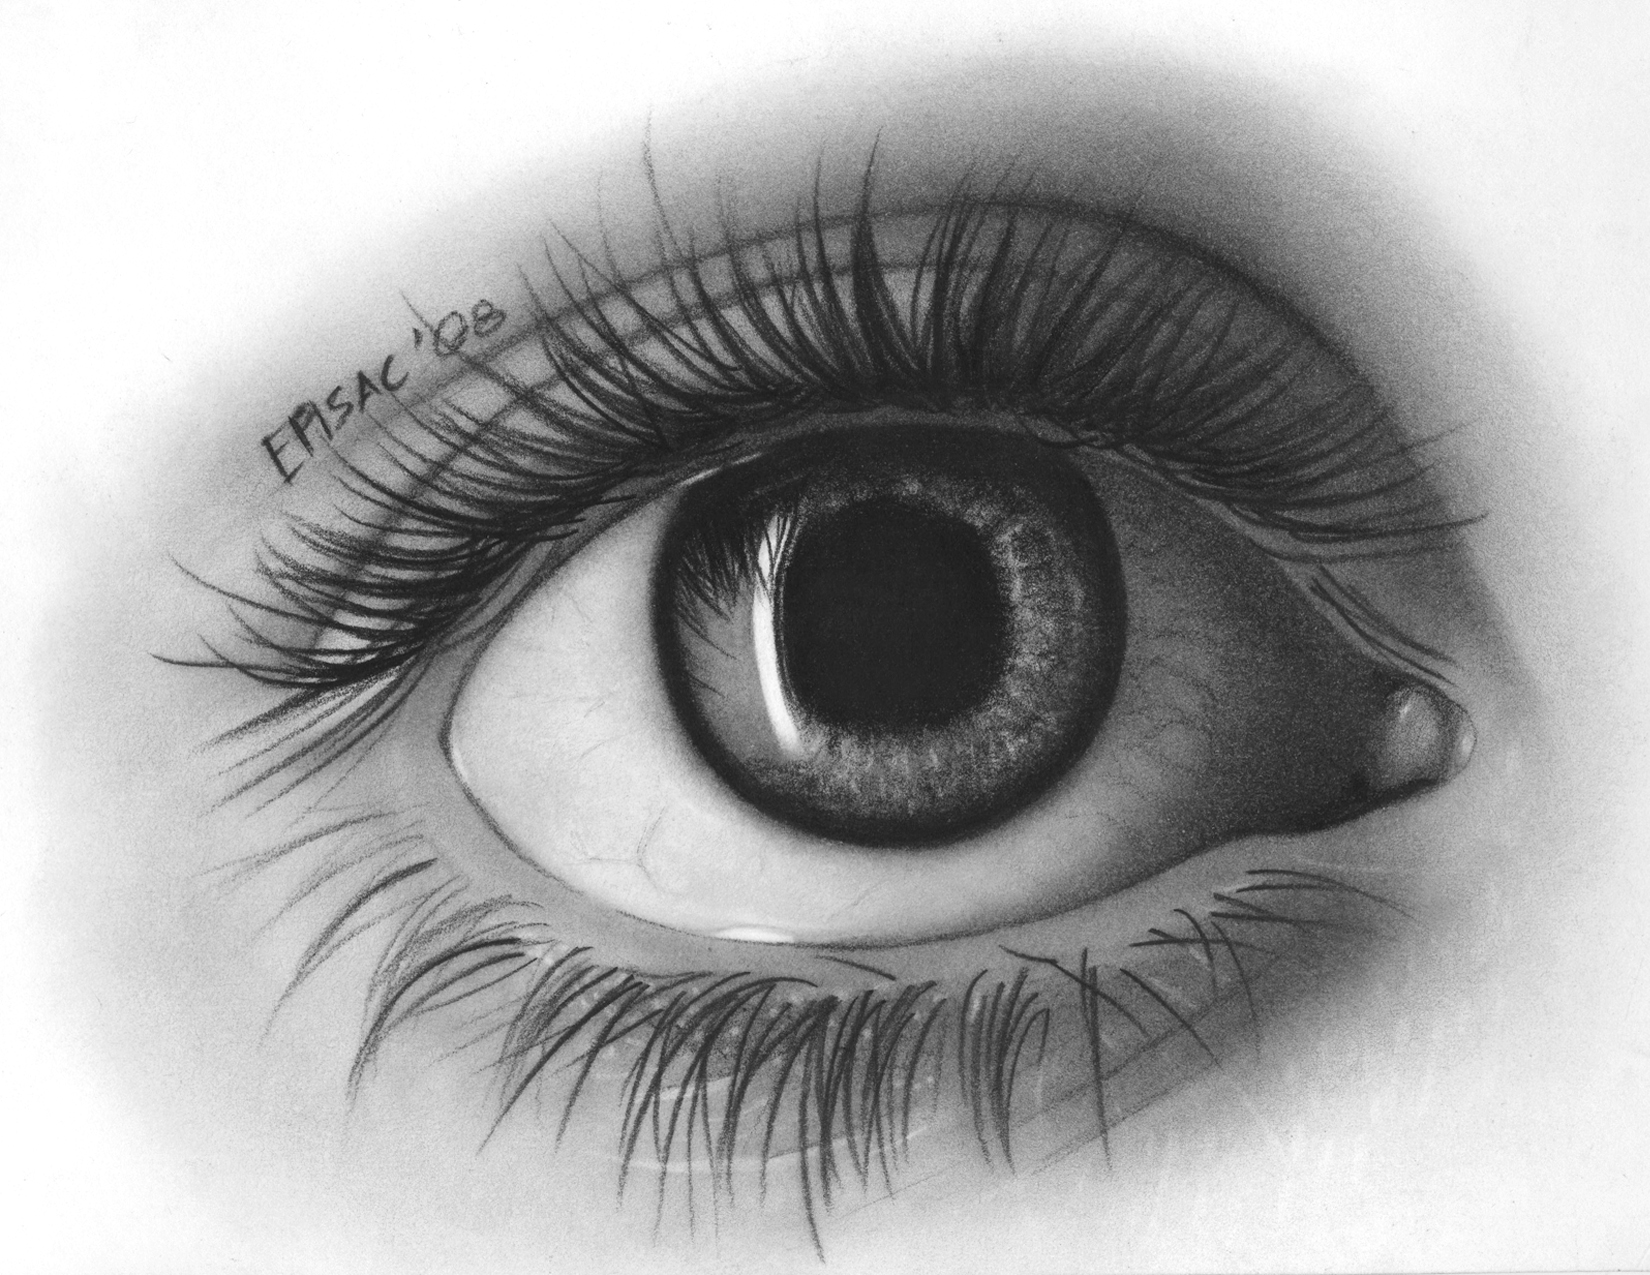 Drawn eyeball black and white Crafts Pinterest & really Art(s)